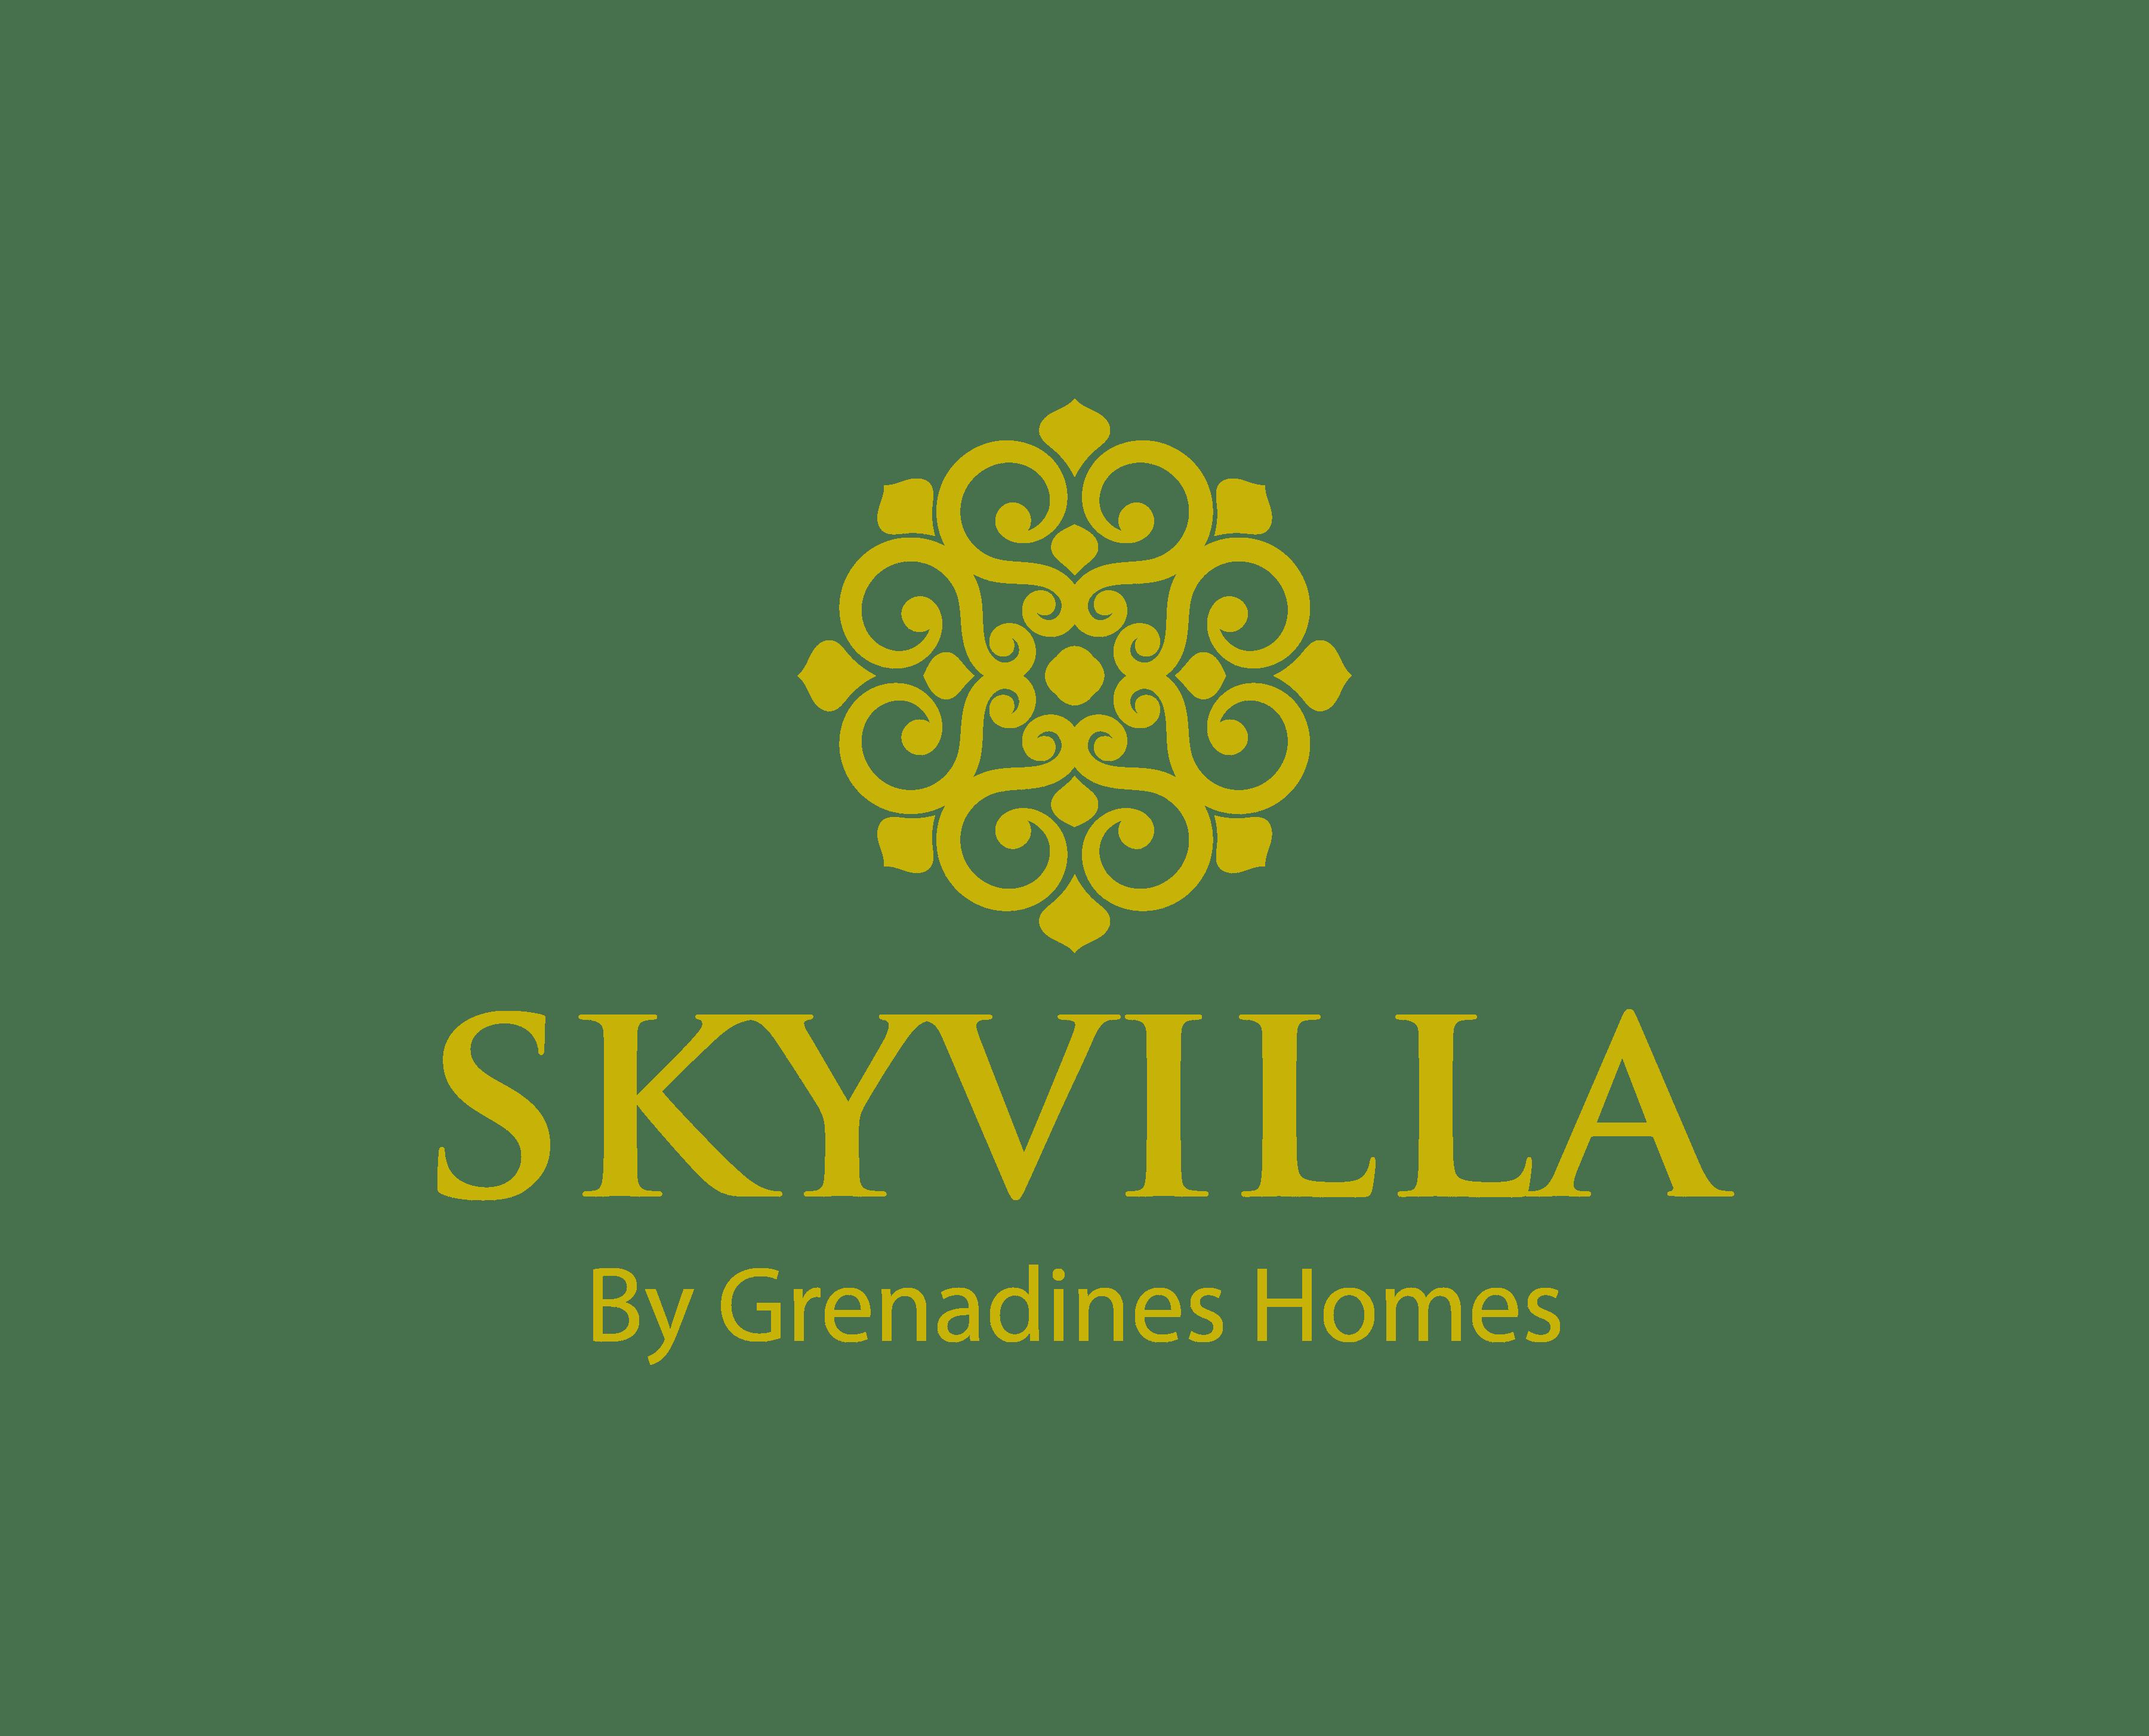 Skyvilla by Grenadines Homes